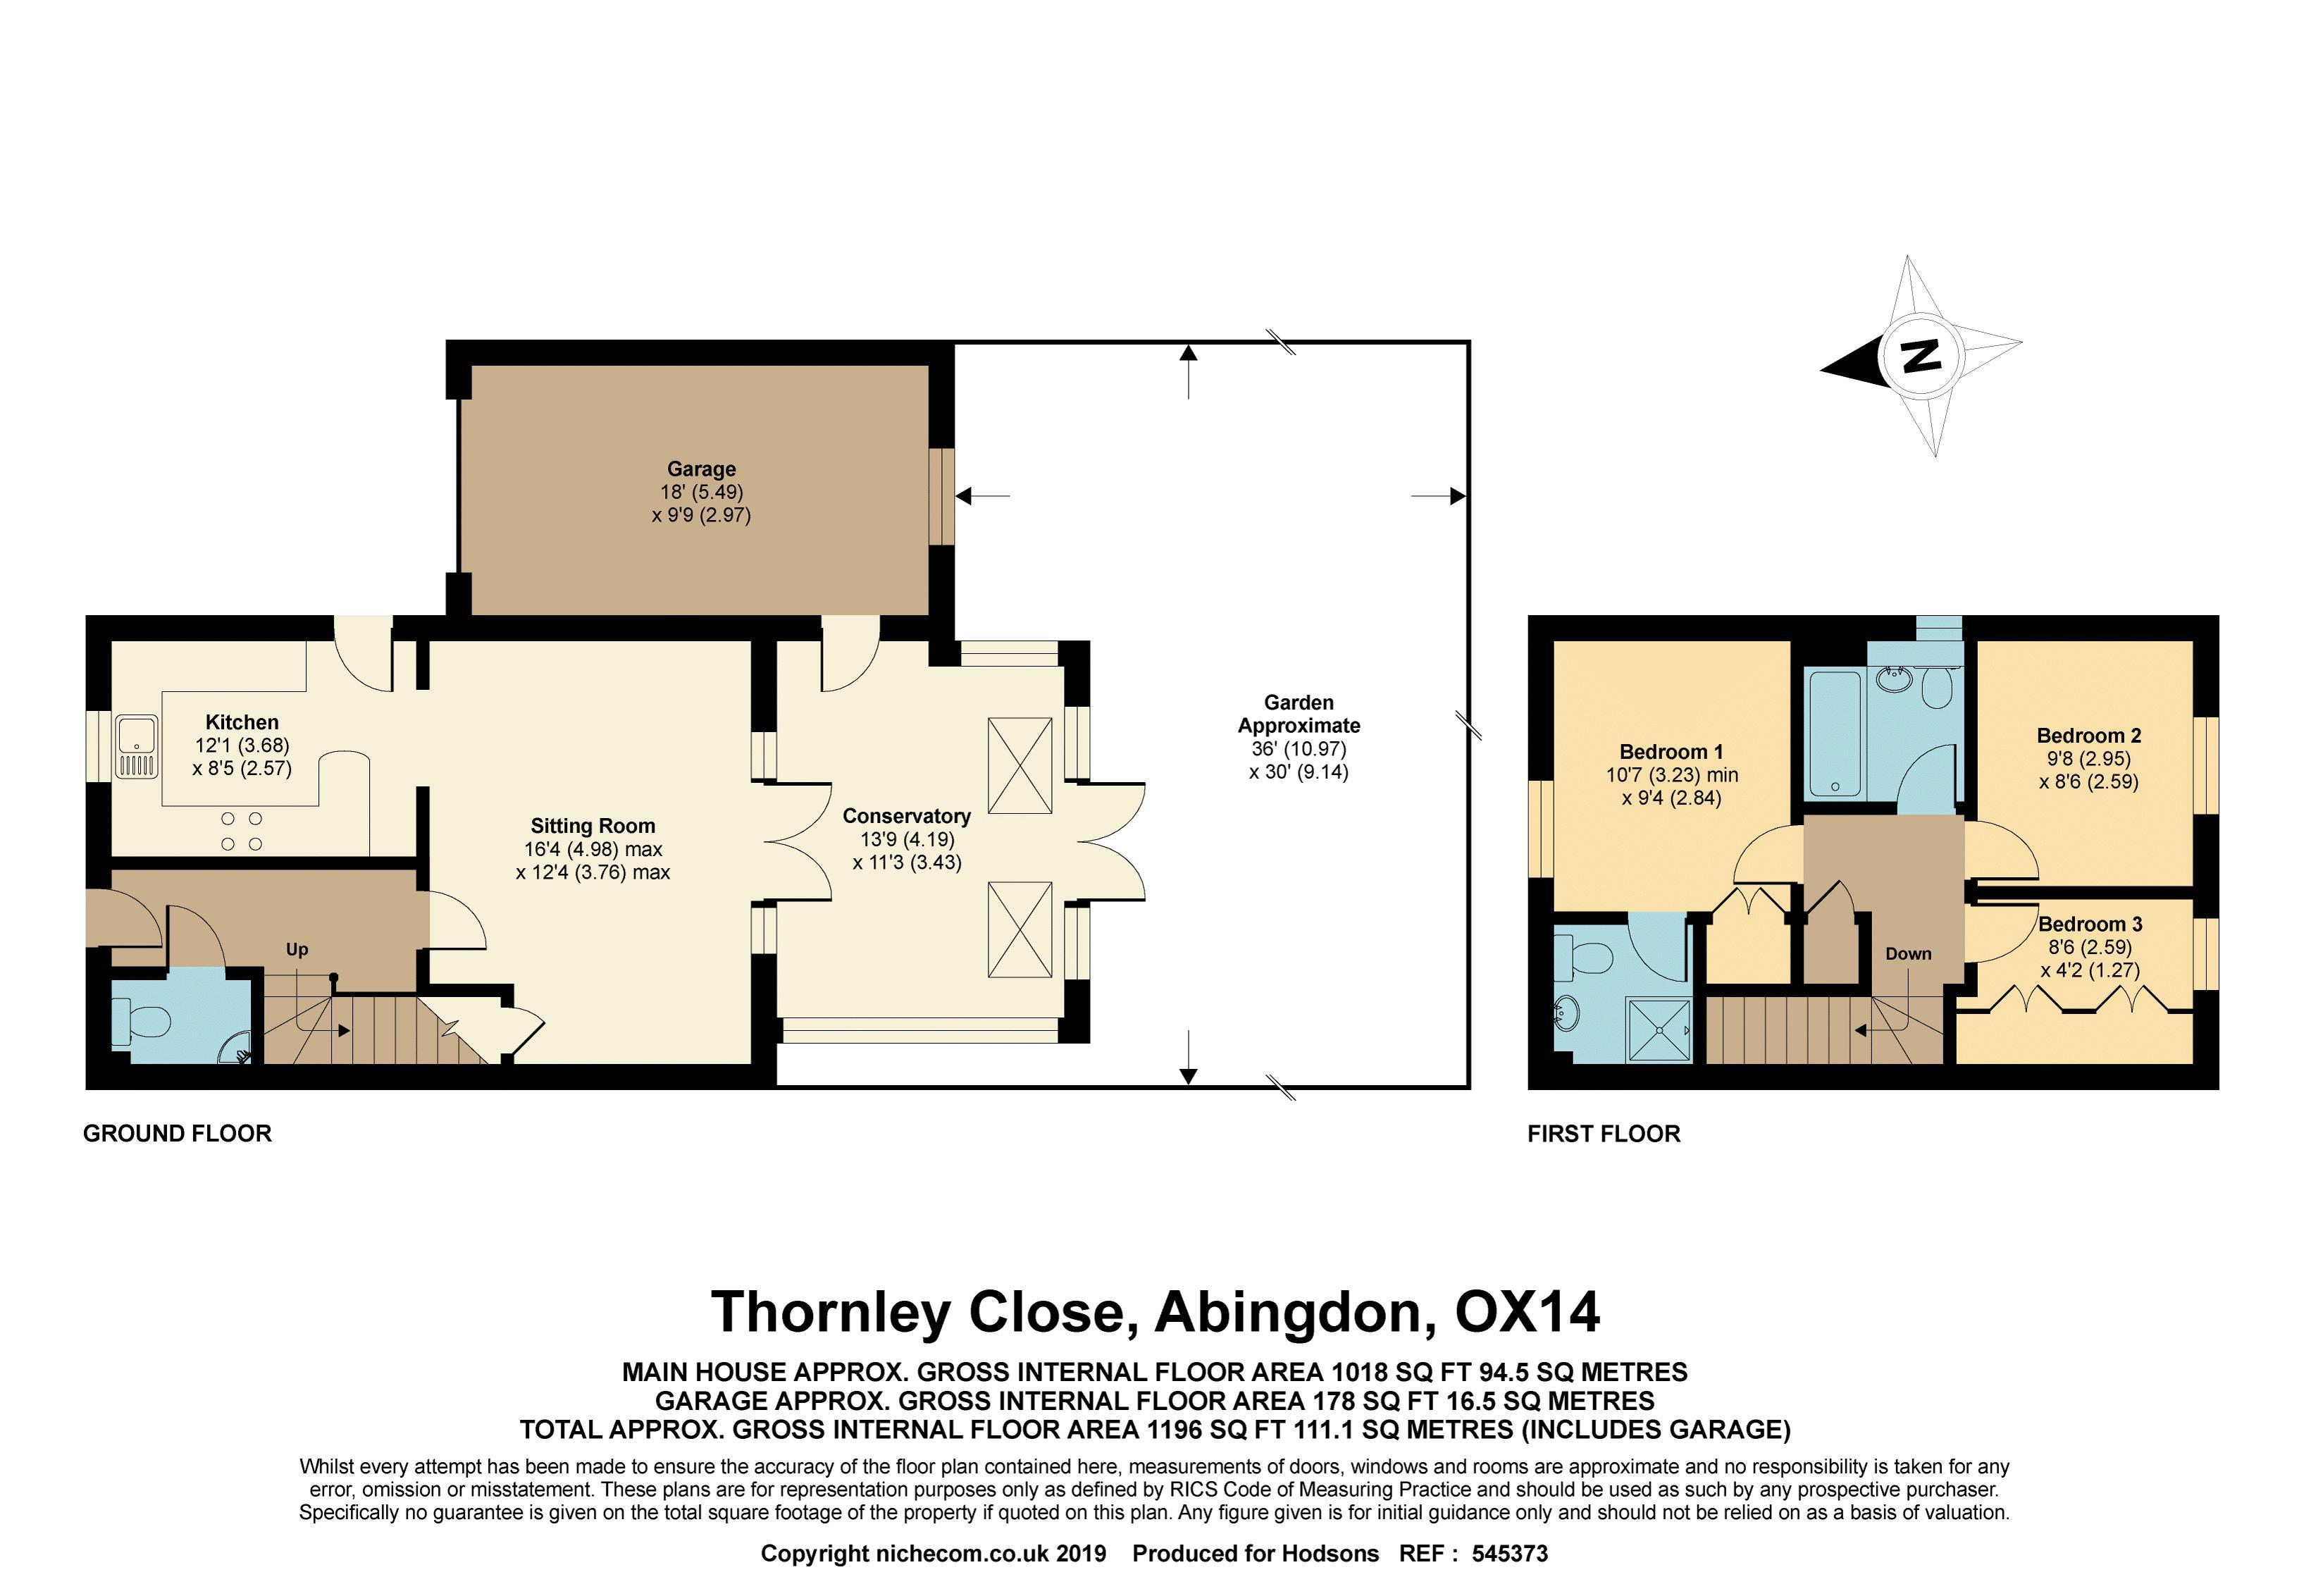 Thornley Close